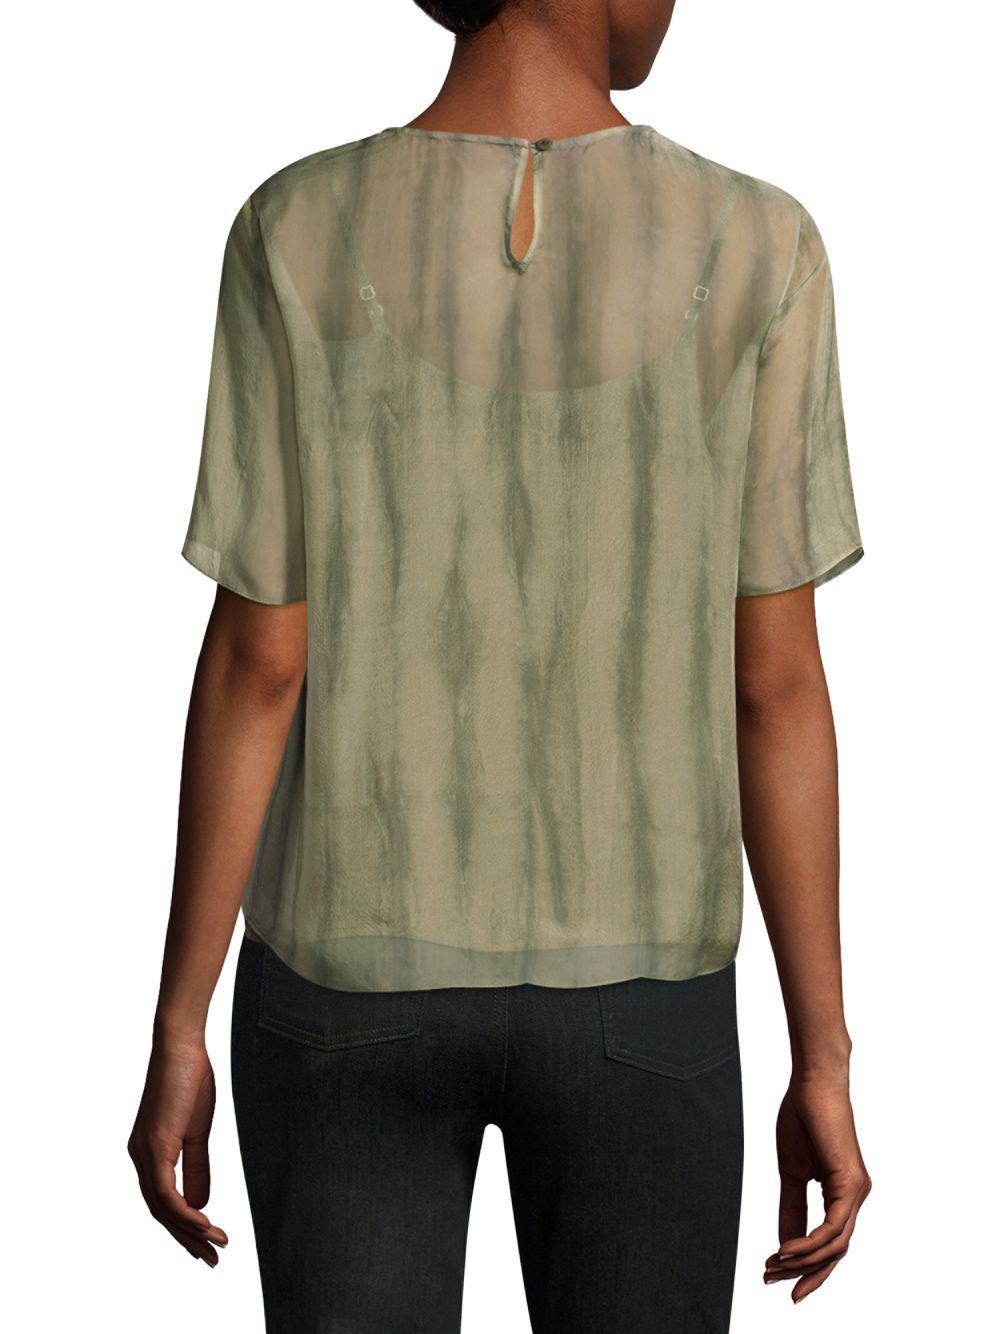 a355d6b9c1 Eileen Fisher - Green Shibori Short-sleeve Silk Box Top - Lyst. View  fullscreen